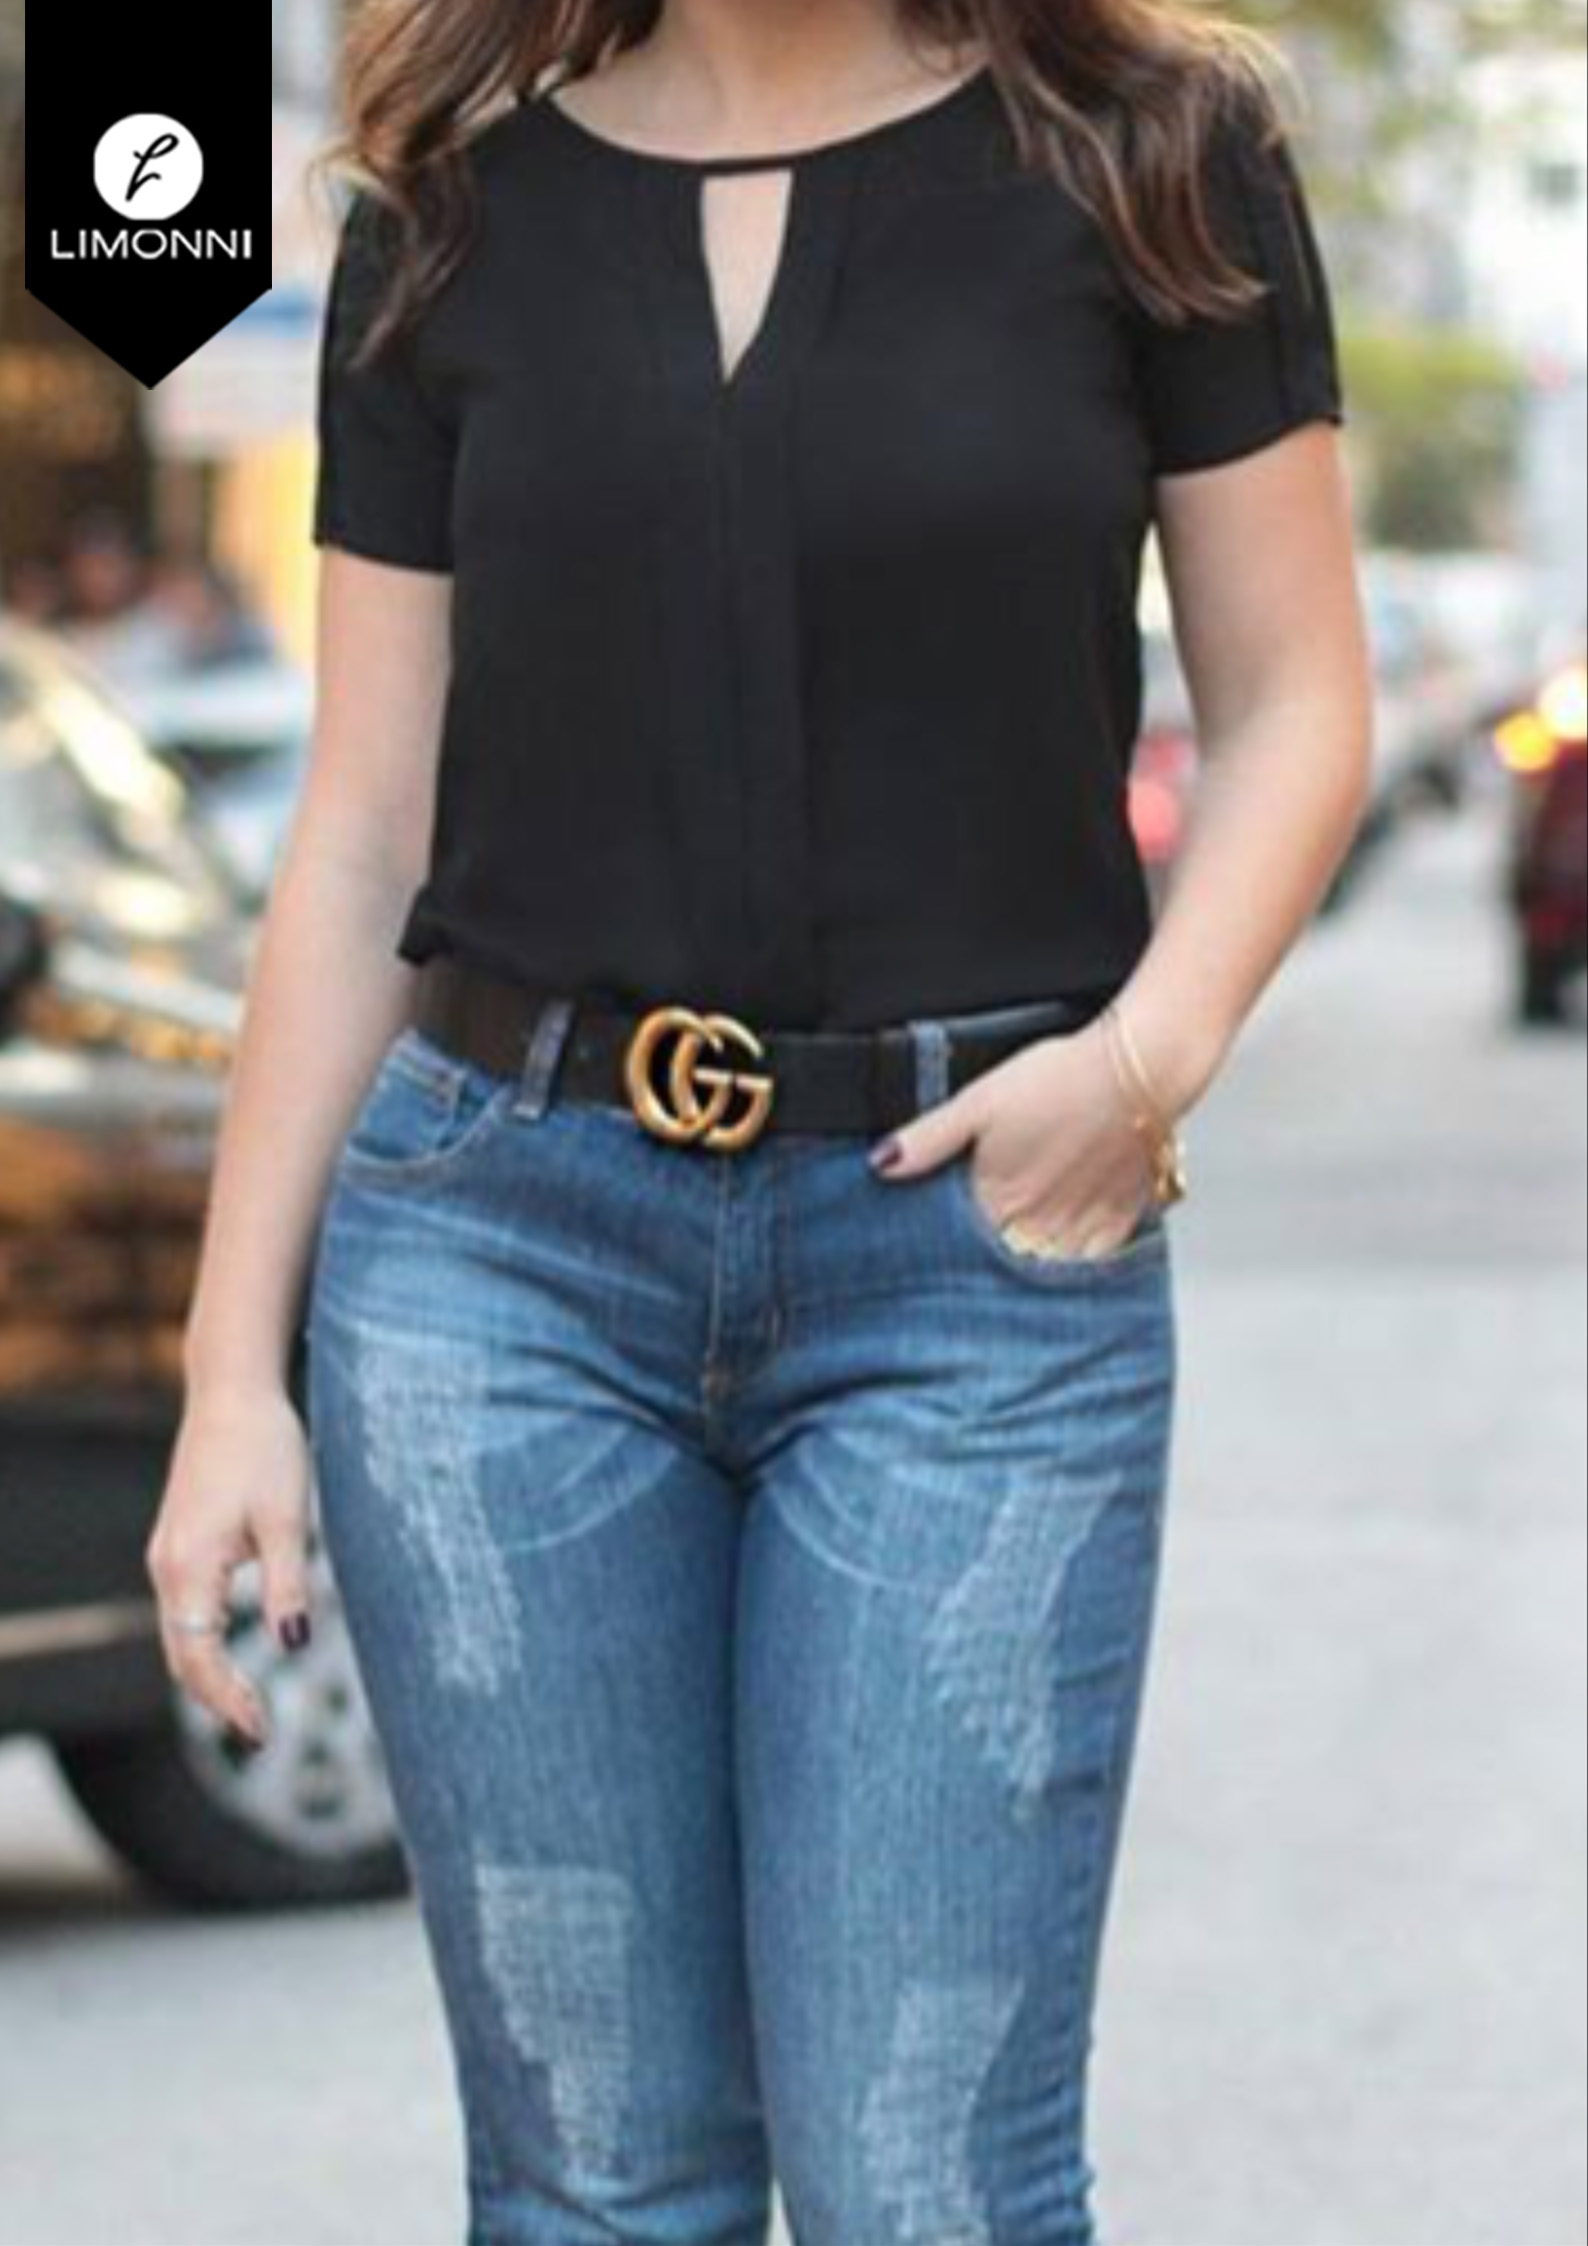 Blusas para mujer Limonni Bennett LI1362 Casuales